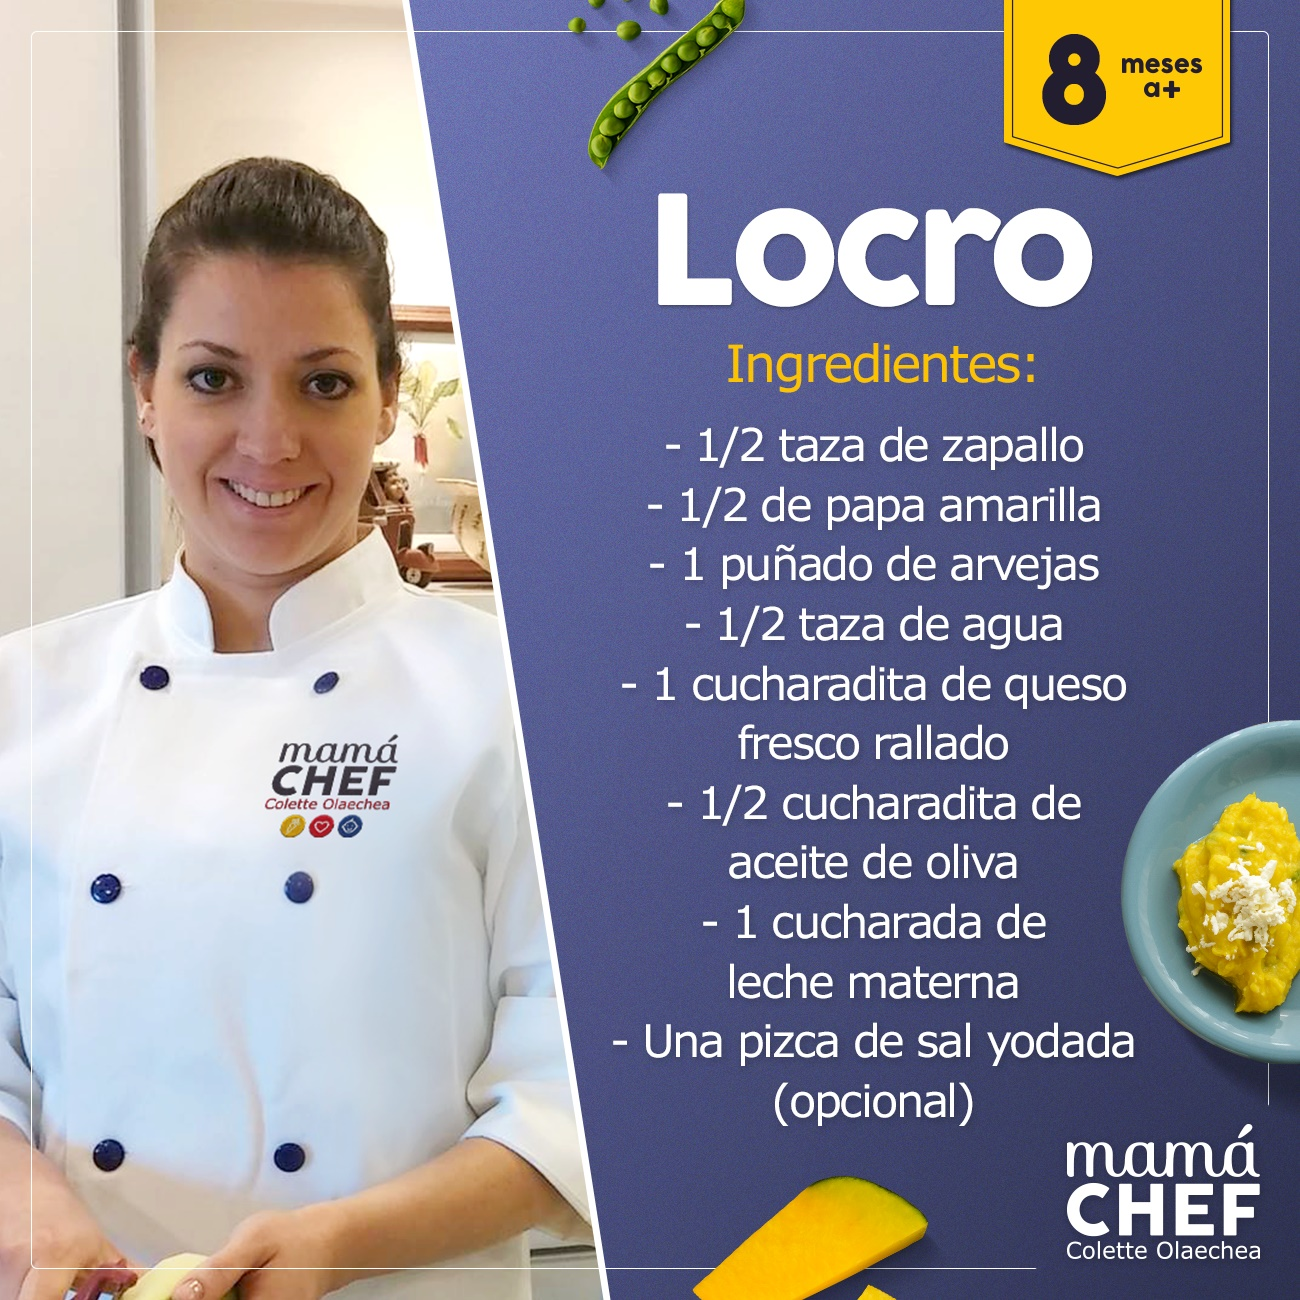 Locro mamá chef colette olaechea recetas  papillas bebes 8 meses